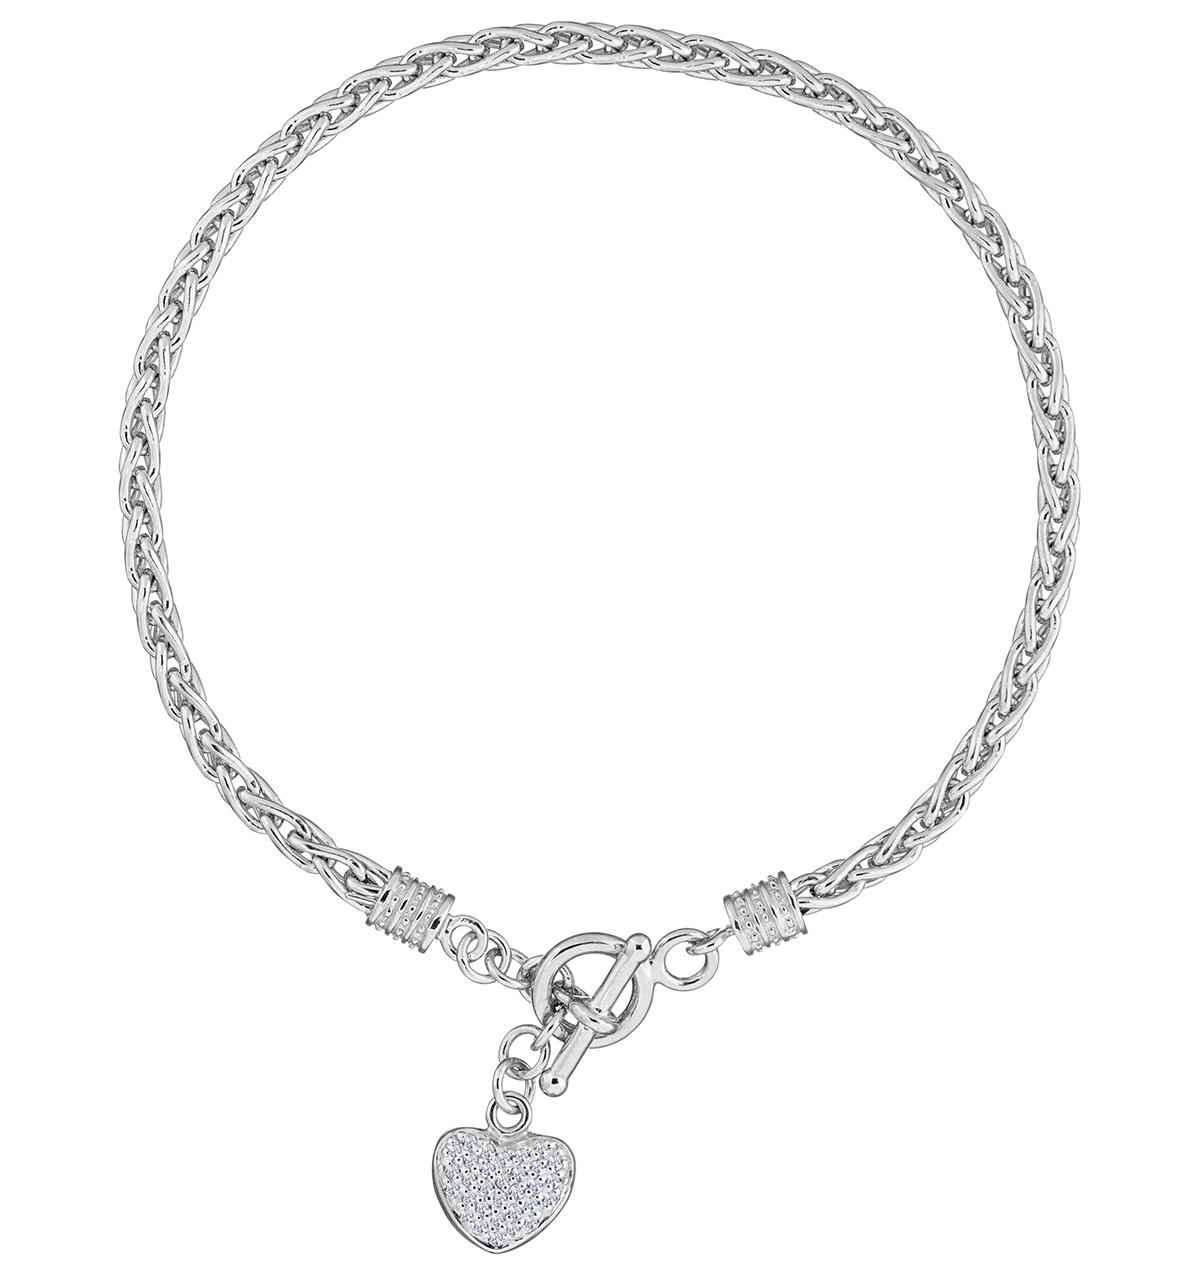 SILVER AND DIAMOND HEART BYZANTINE BRACELET - TESORO COLLECTION